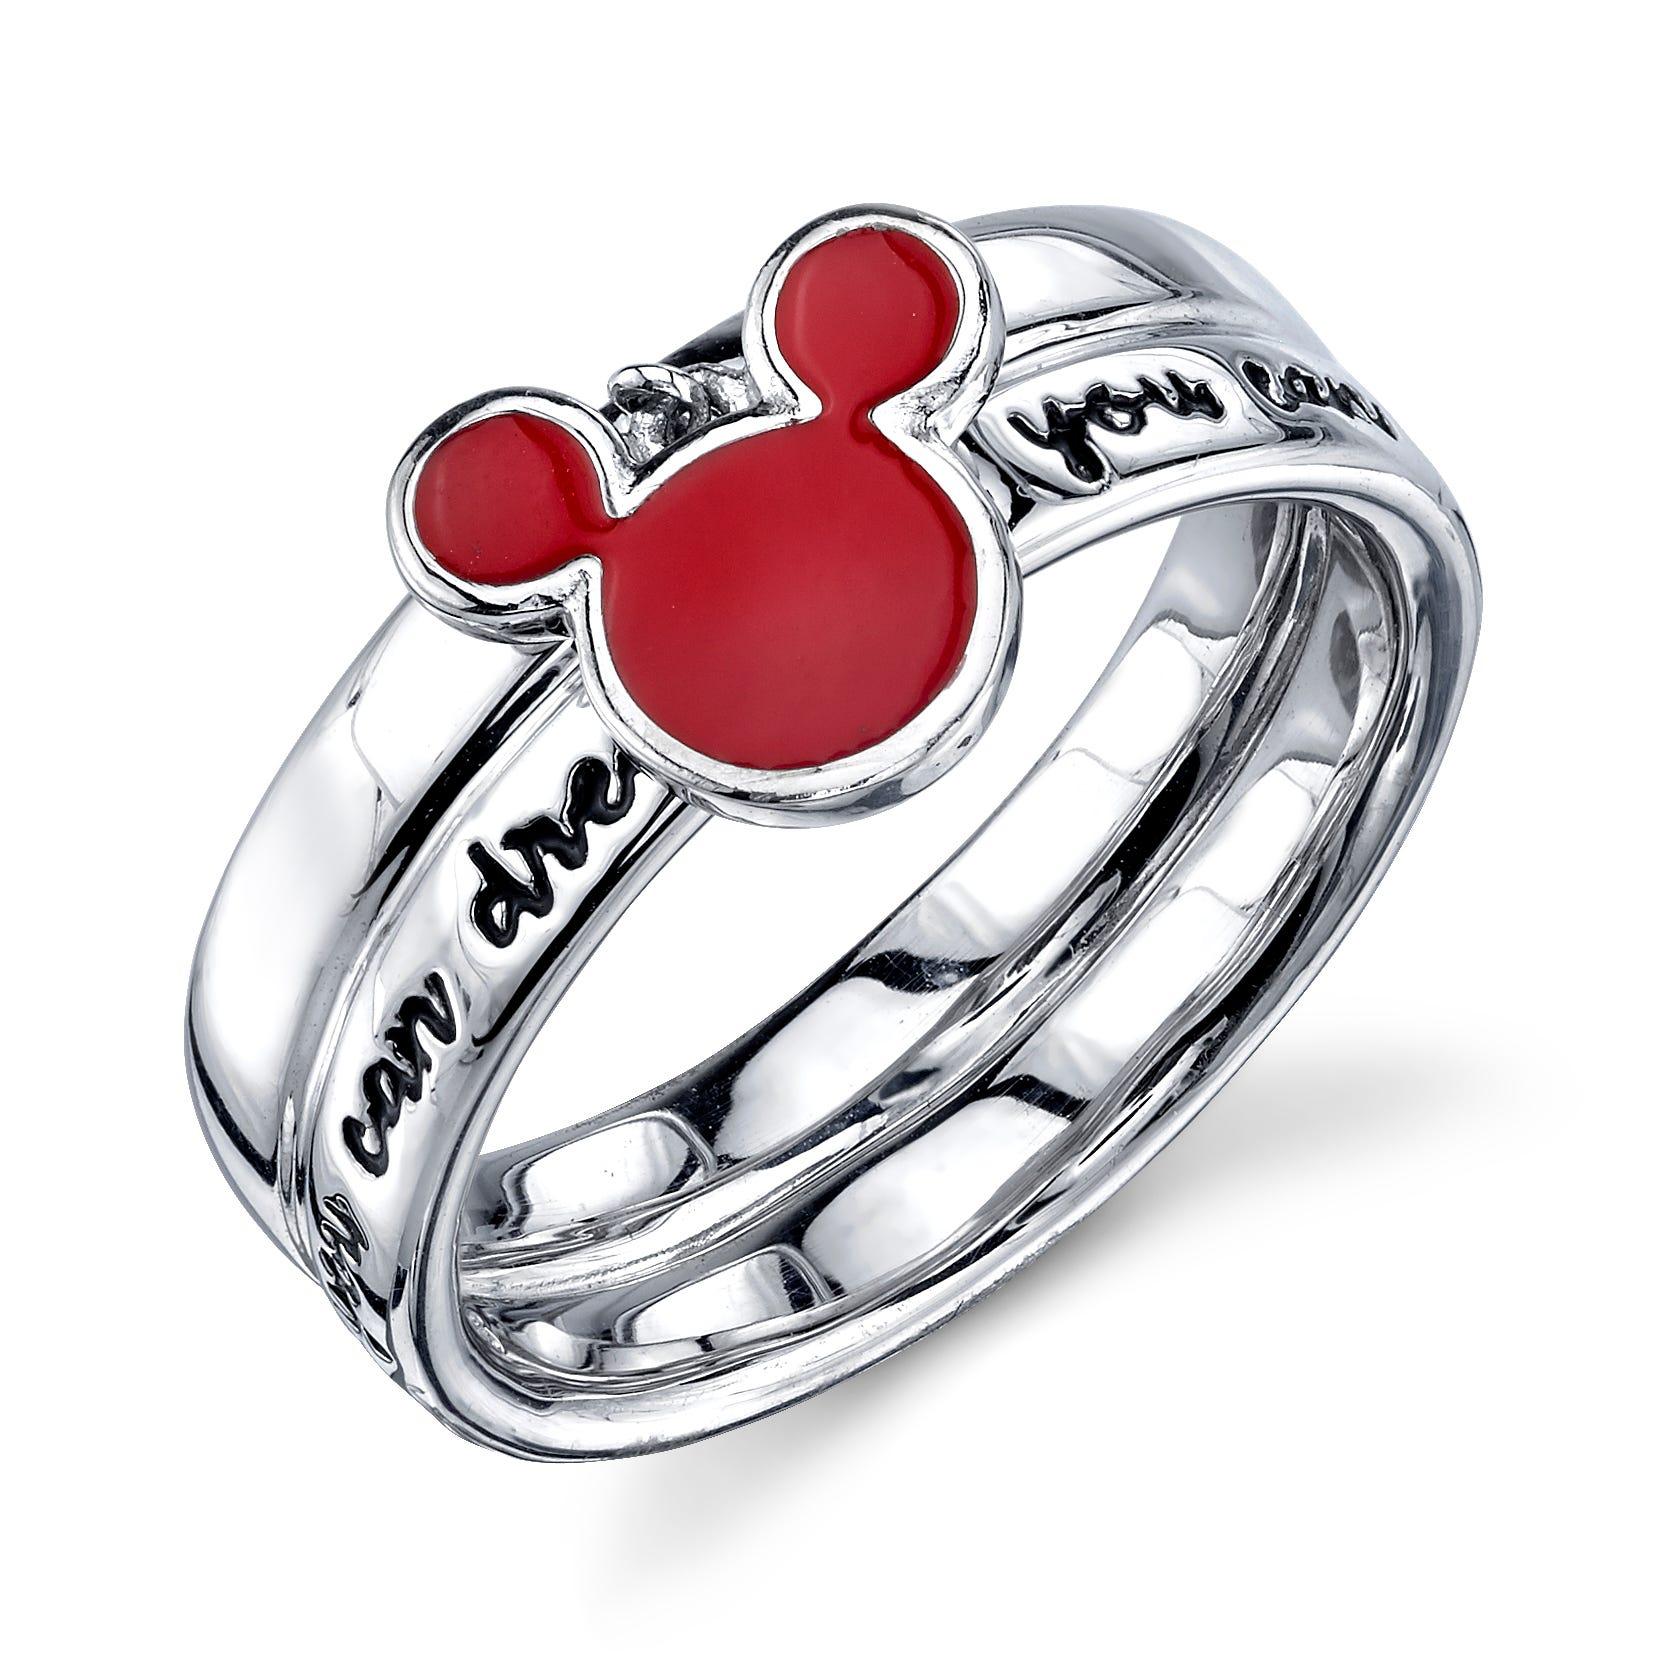 DISNEY© Disney's Mickey Mouse